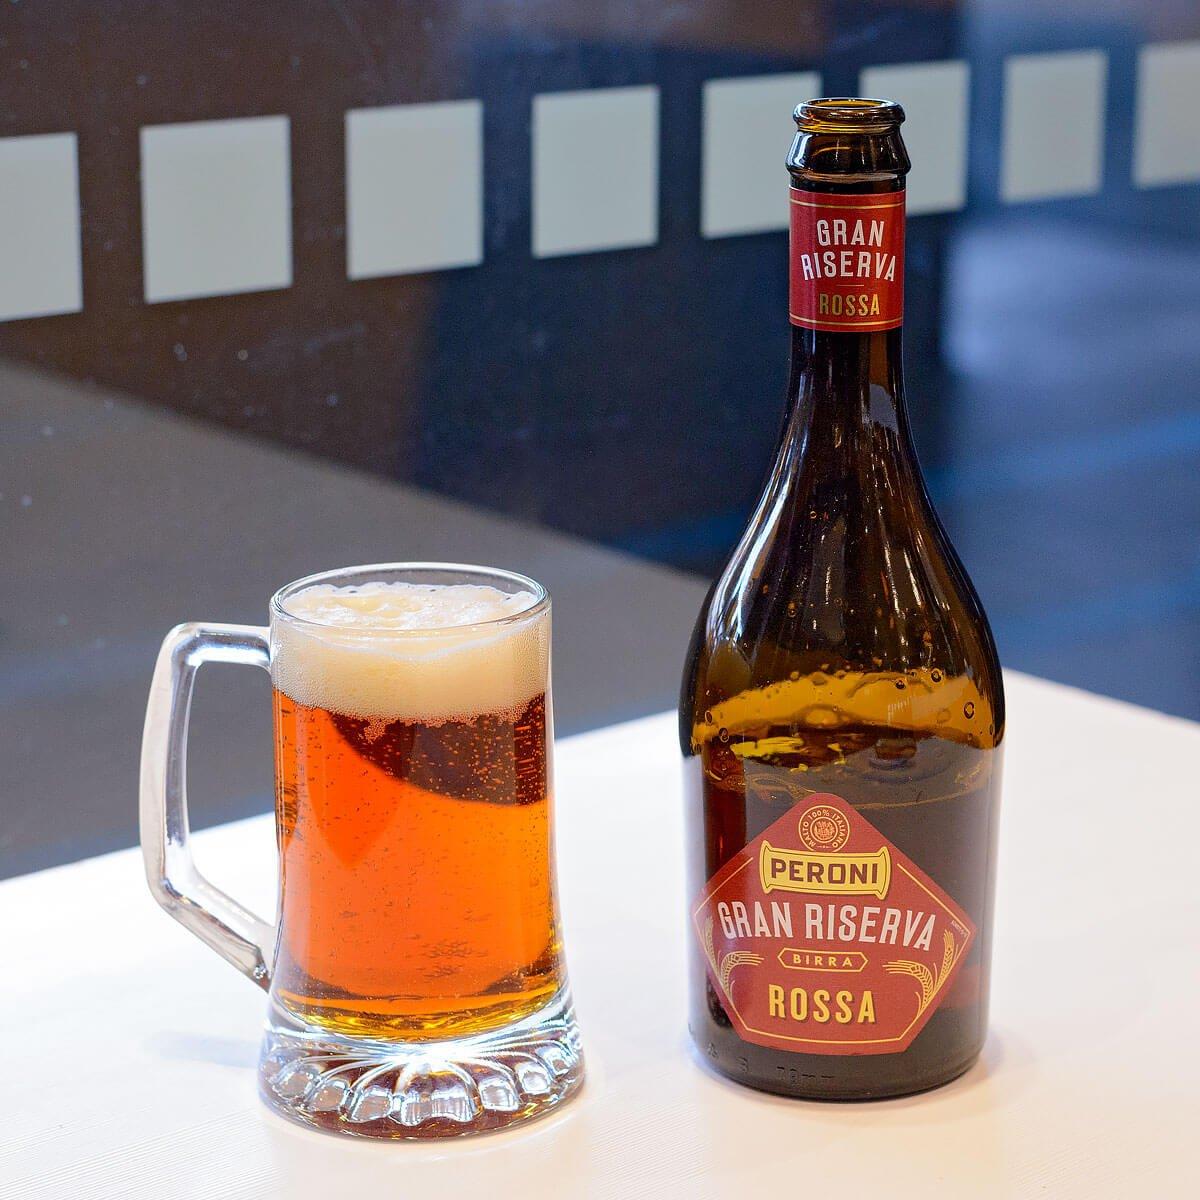 Gran Riserva Rossa, a Vienna Lager by Birra Peroni Industriale S.p.A.